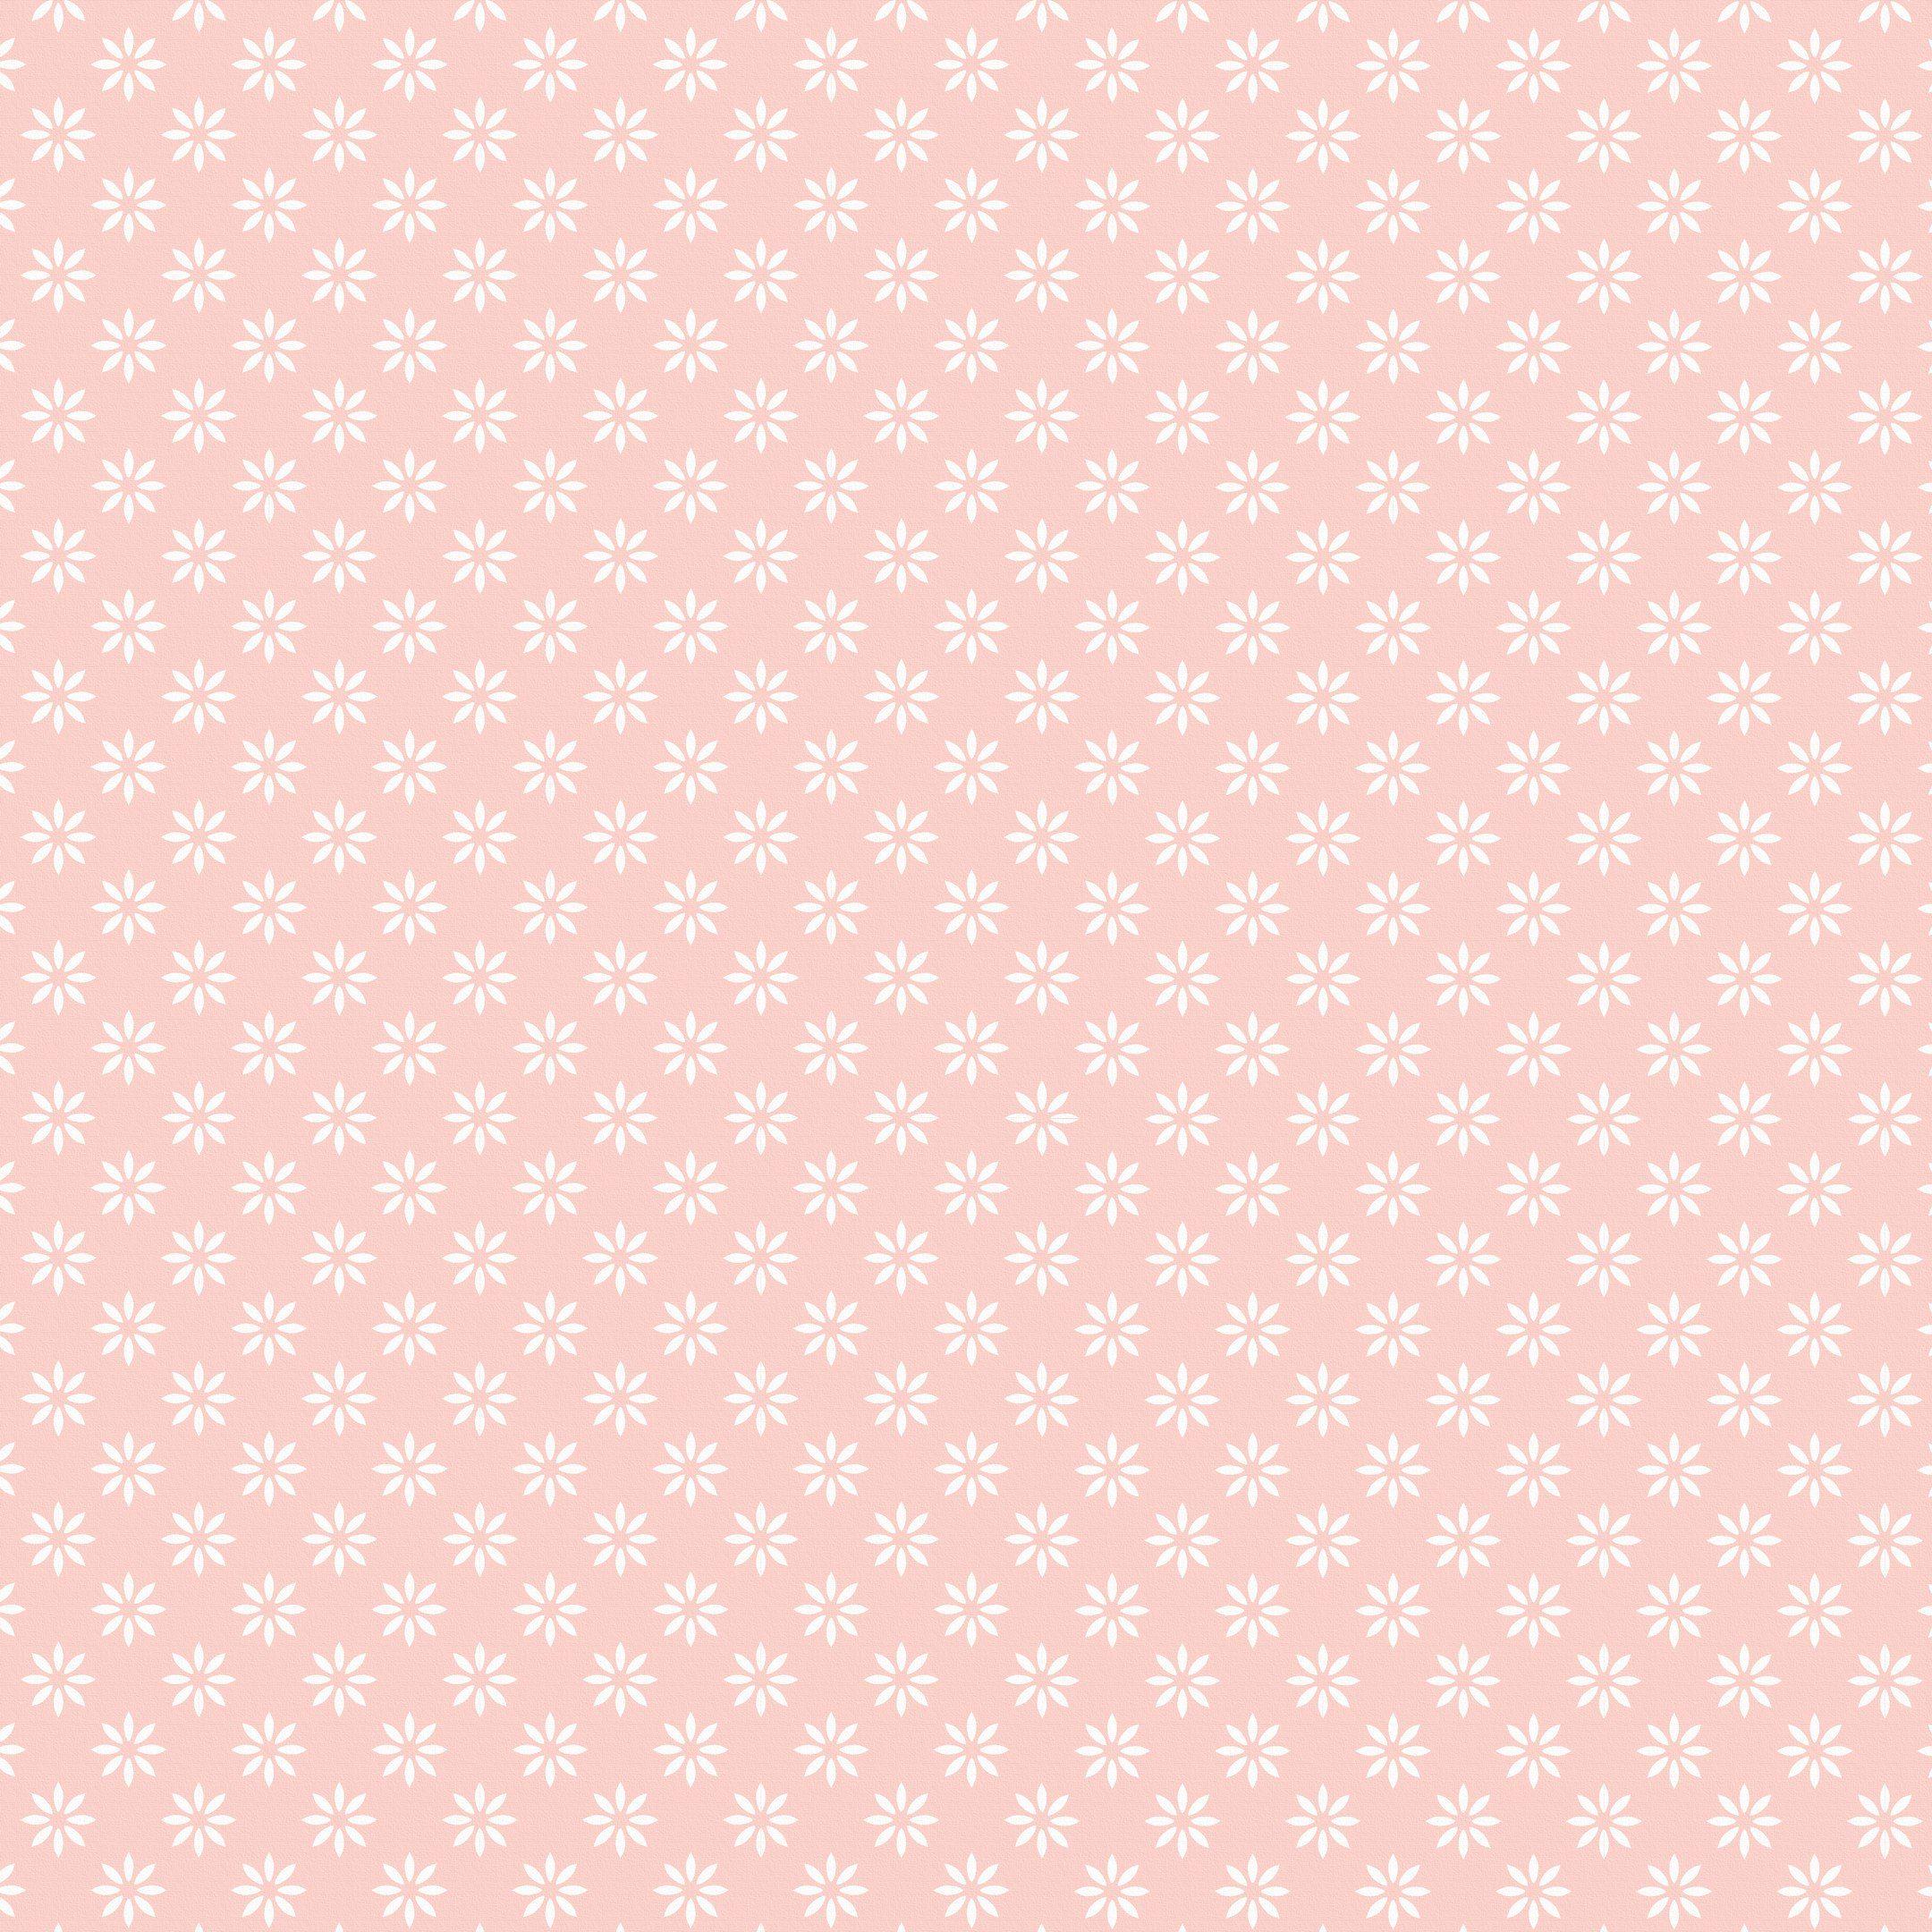 background flowers cute pastel illustration pink